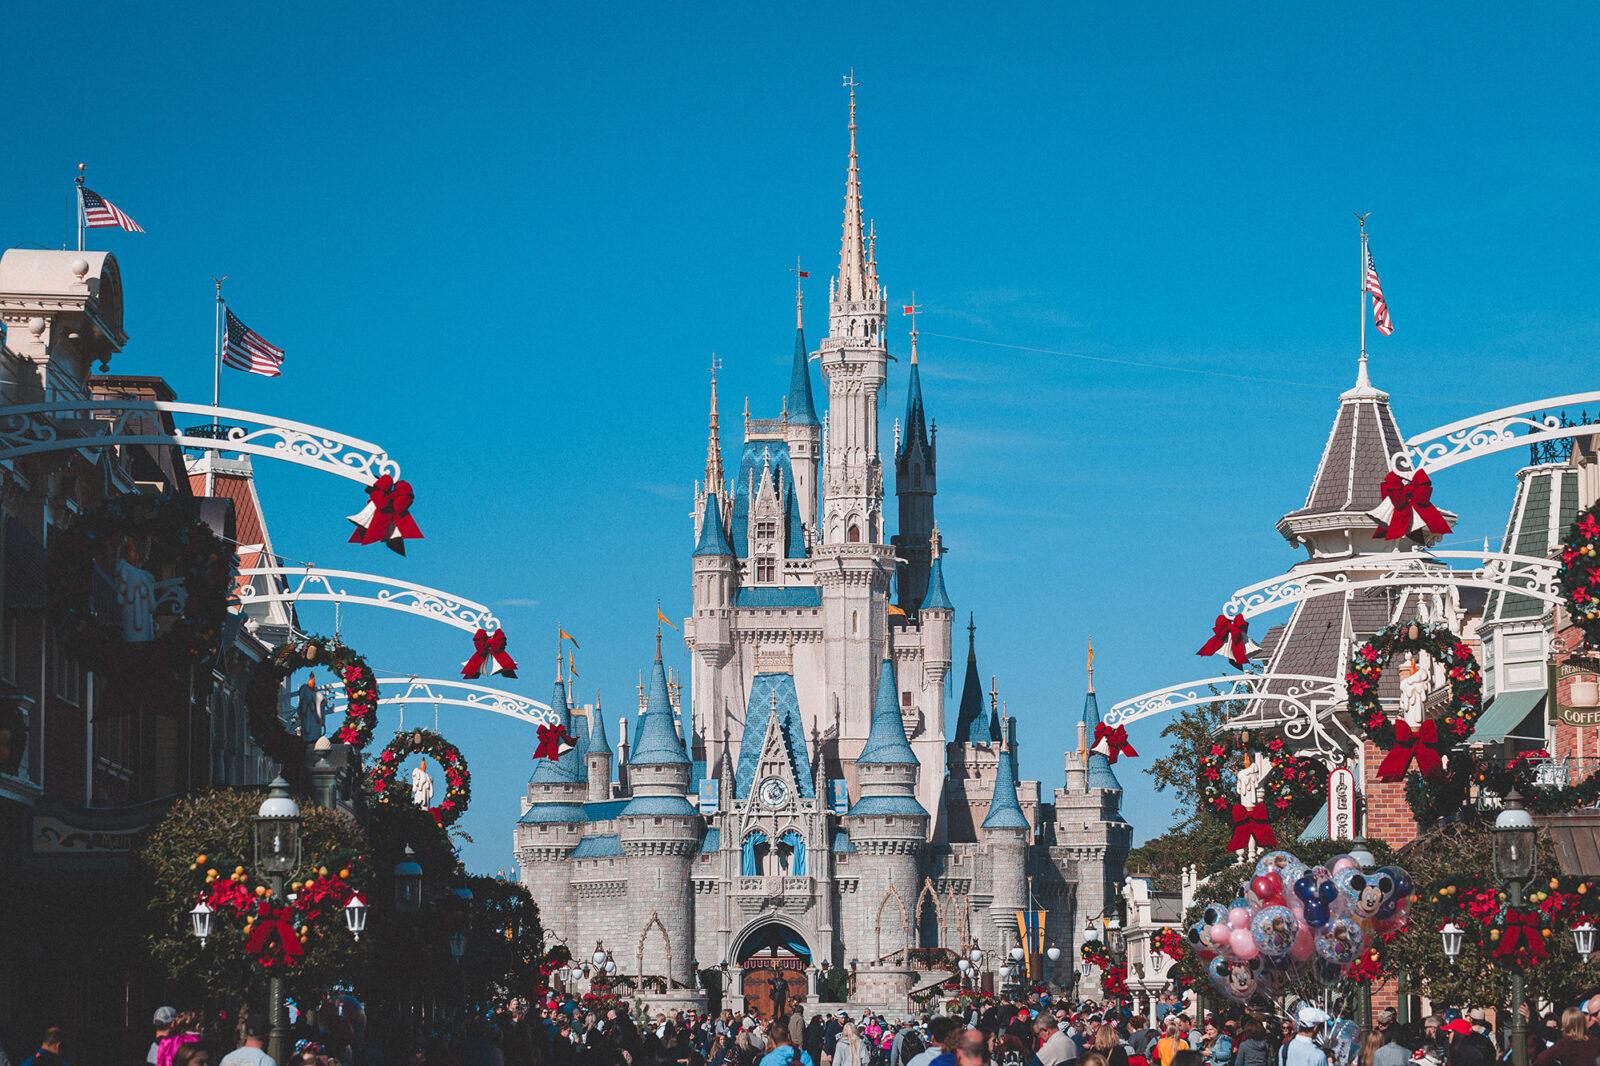 Walt Disney World, Disneyland, Disney Parks